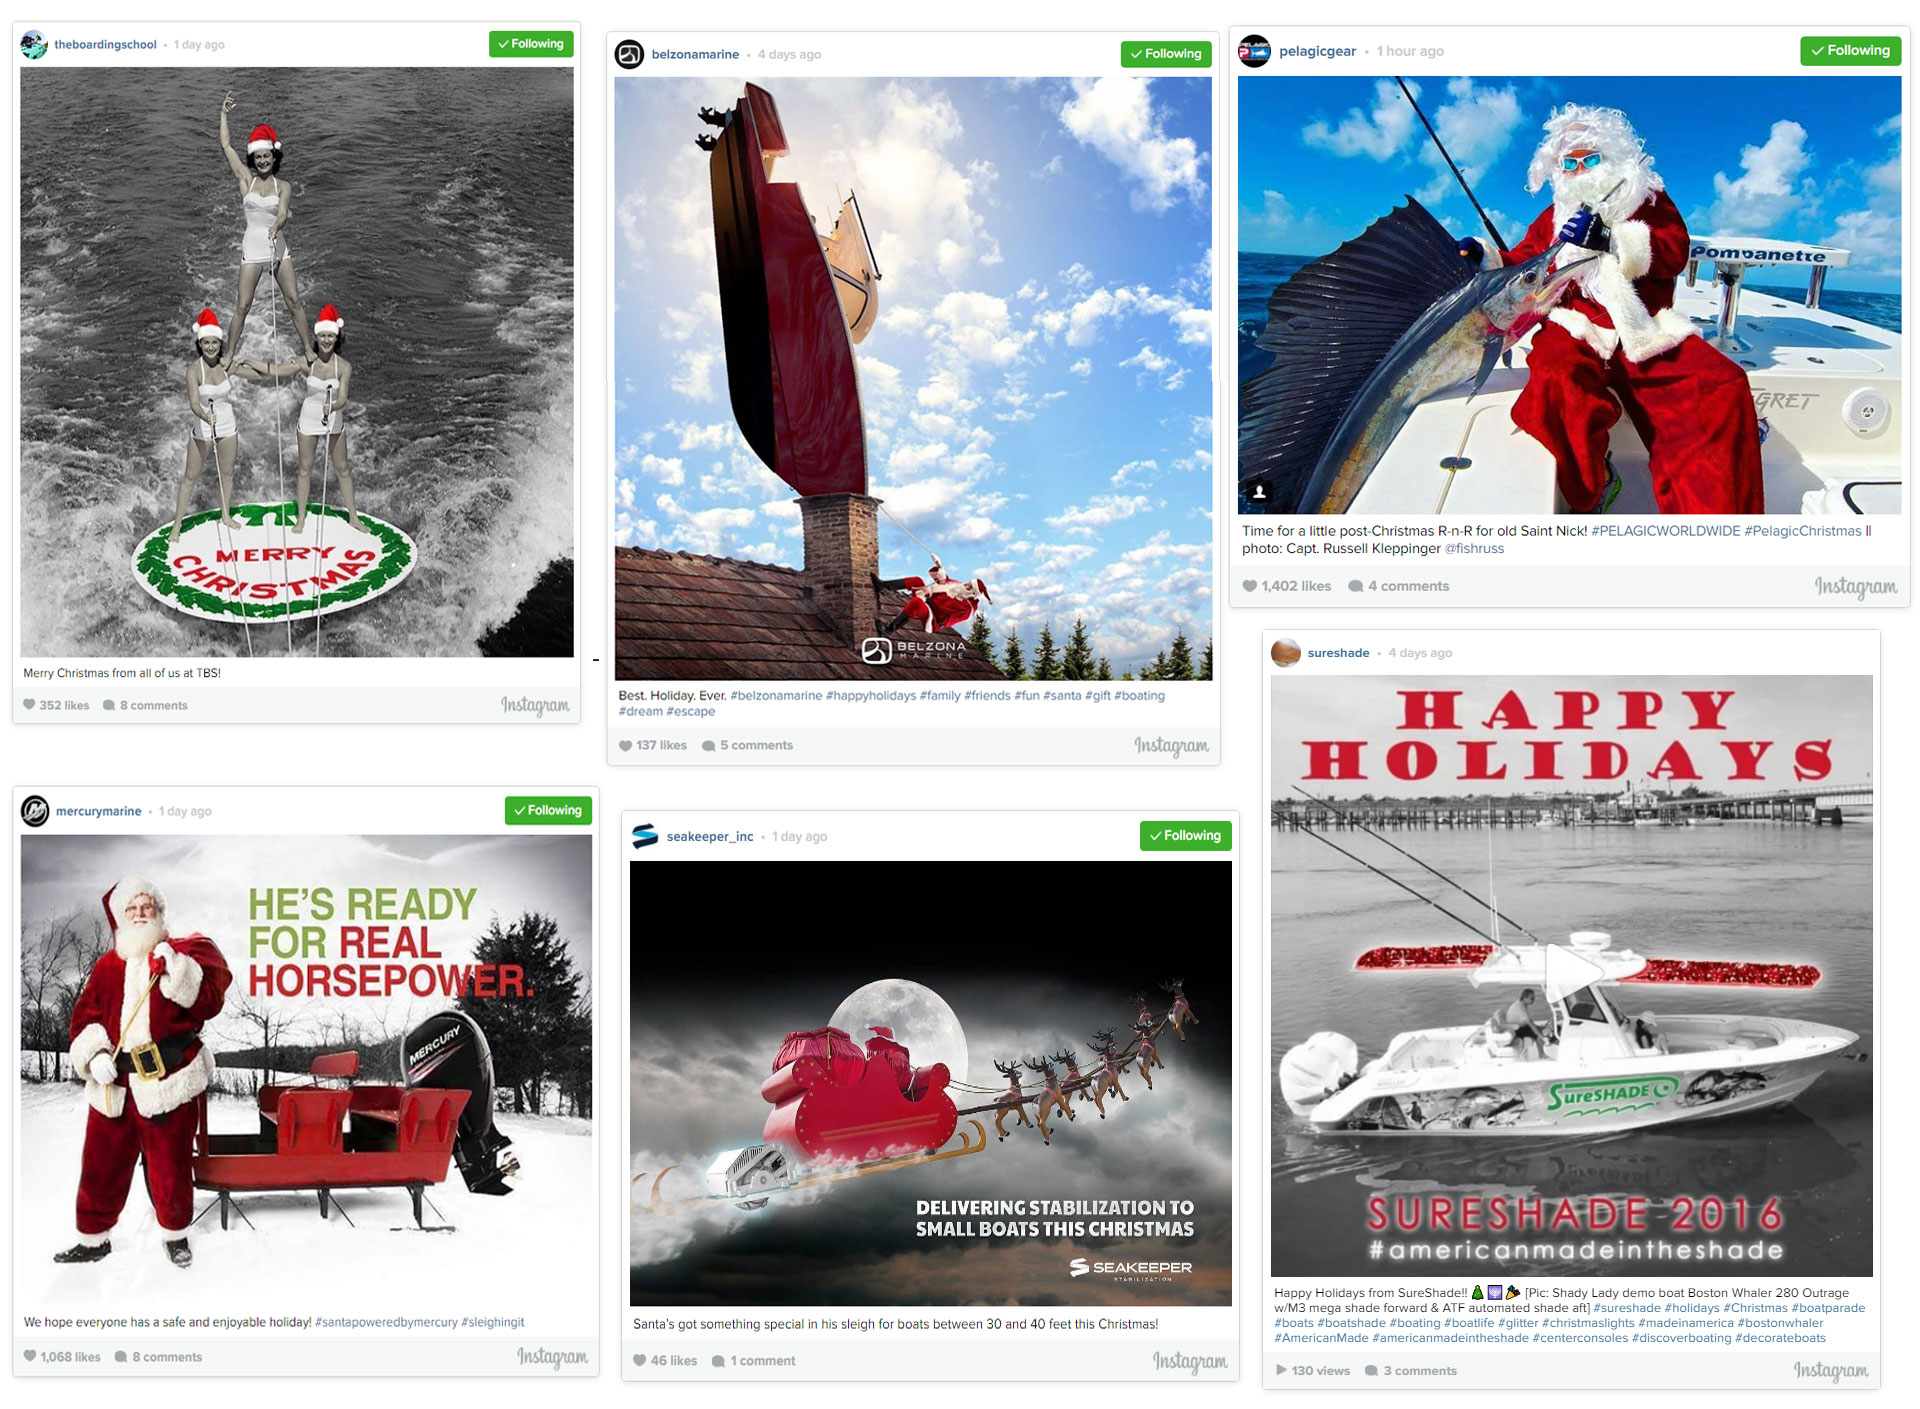 Holiday Boating Posts